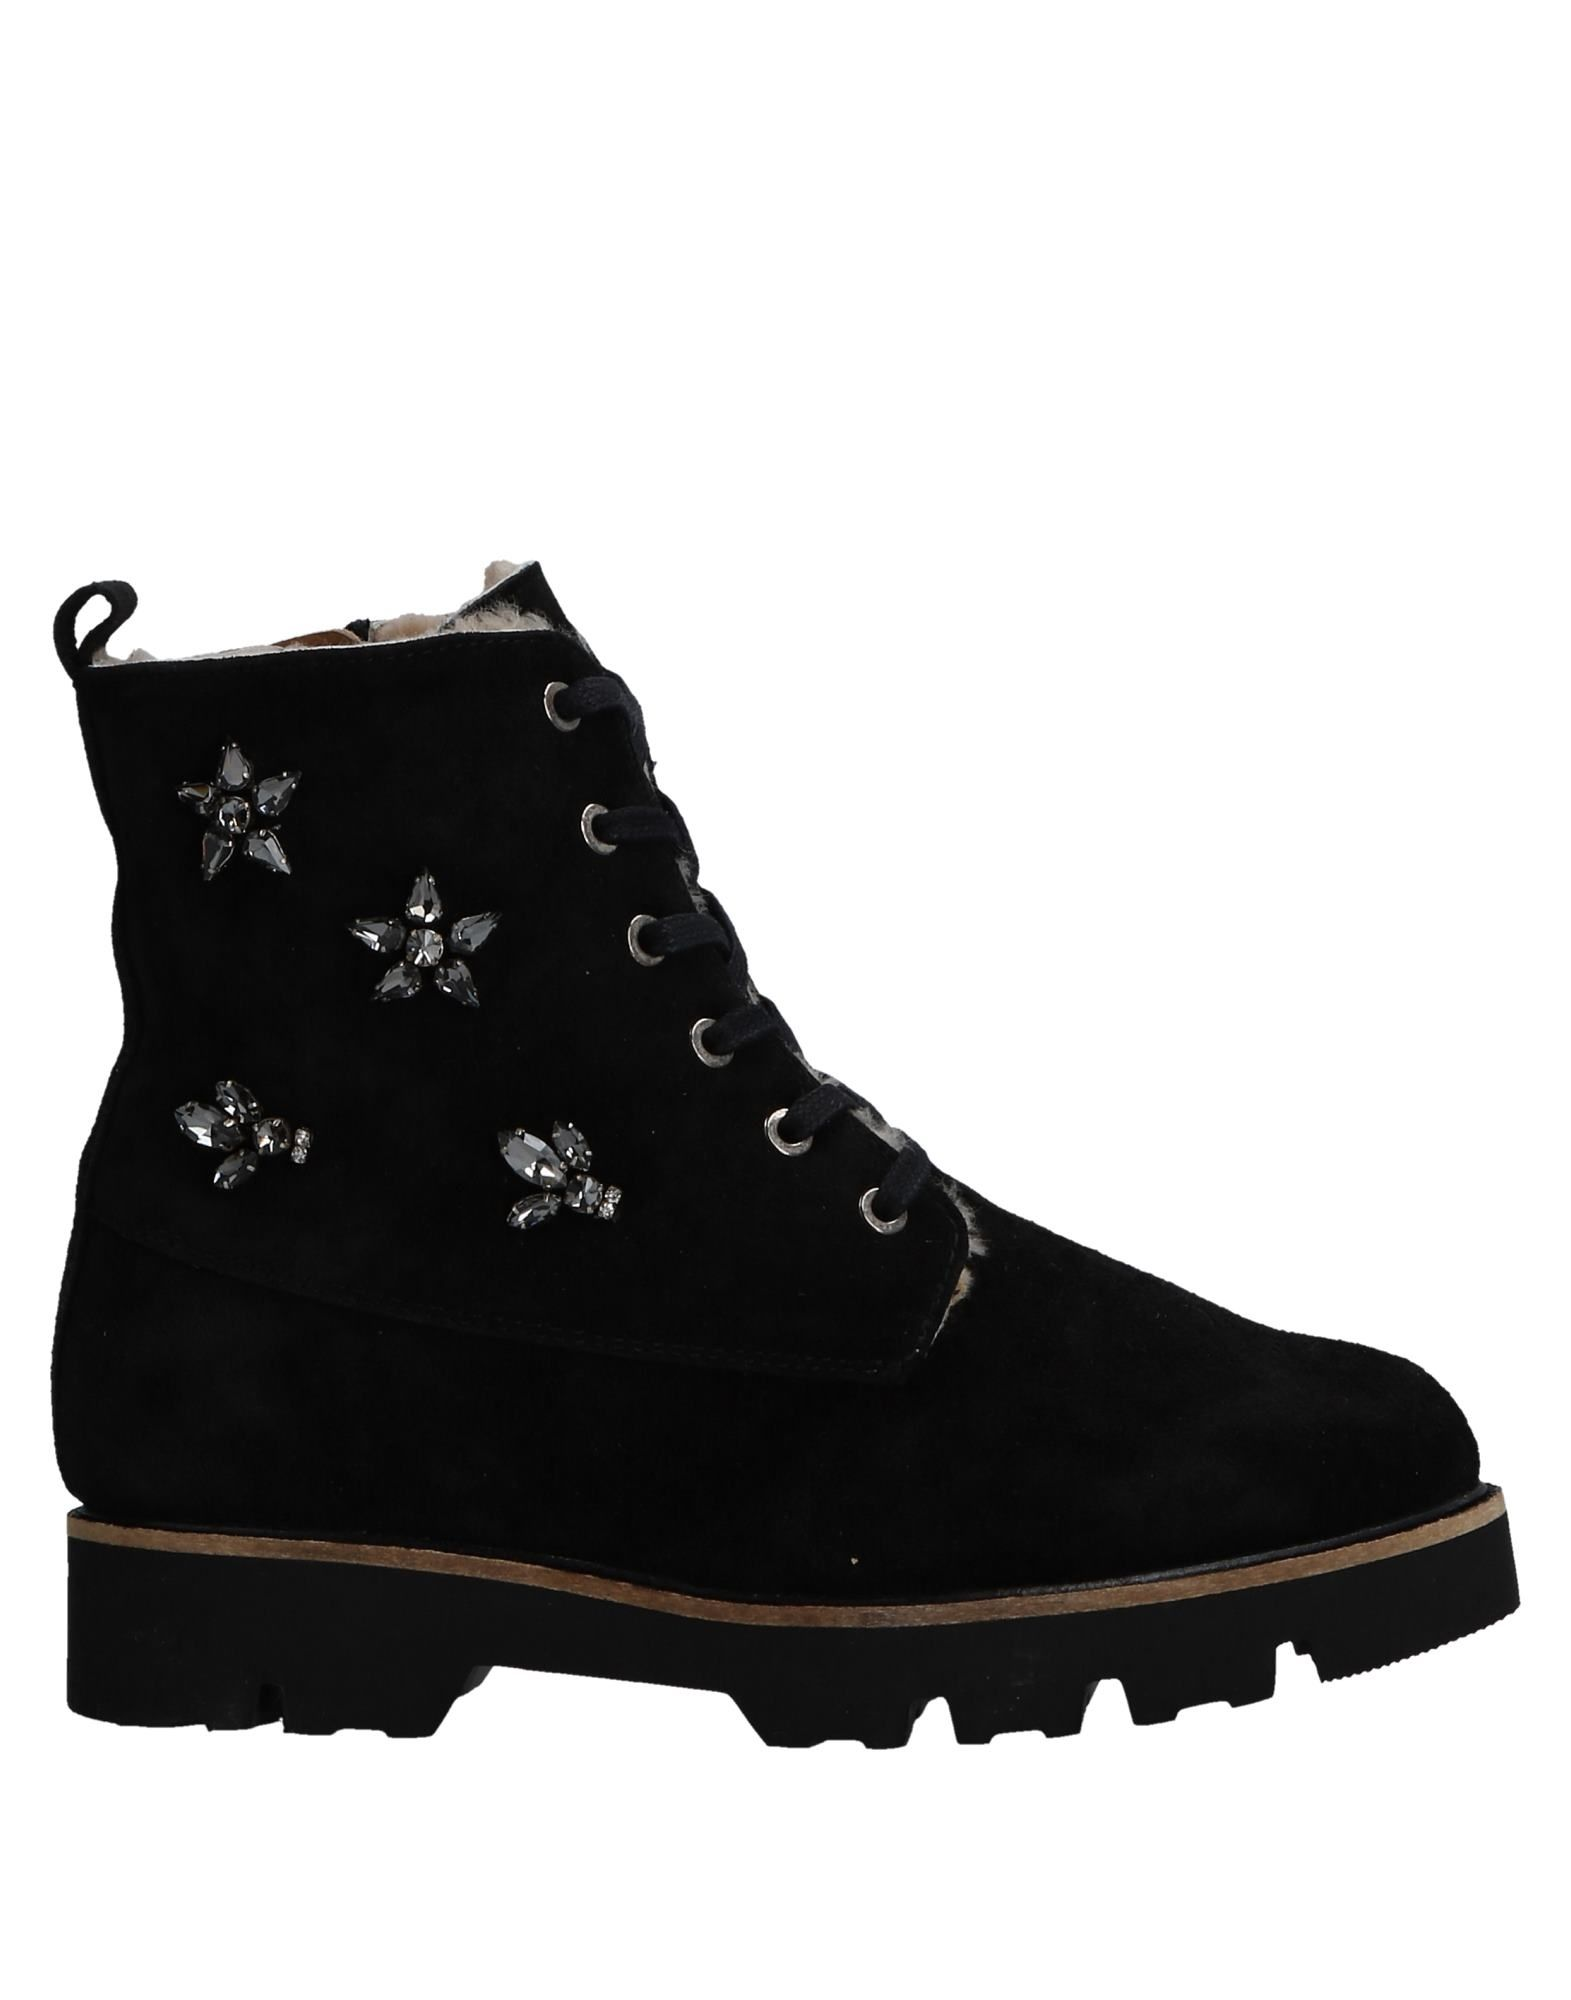 Gut um billige Schuhe Damen zu tragenPedro Antón Stiefelette Damen Schuhe  11511754MO a701a8